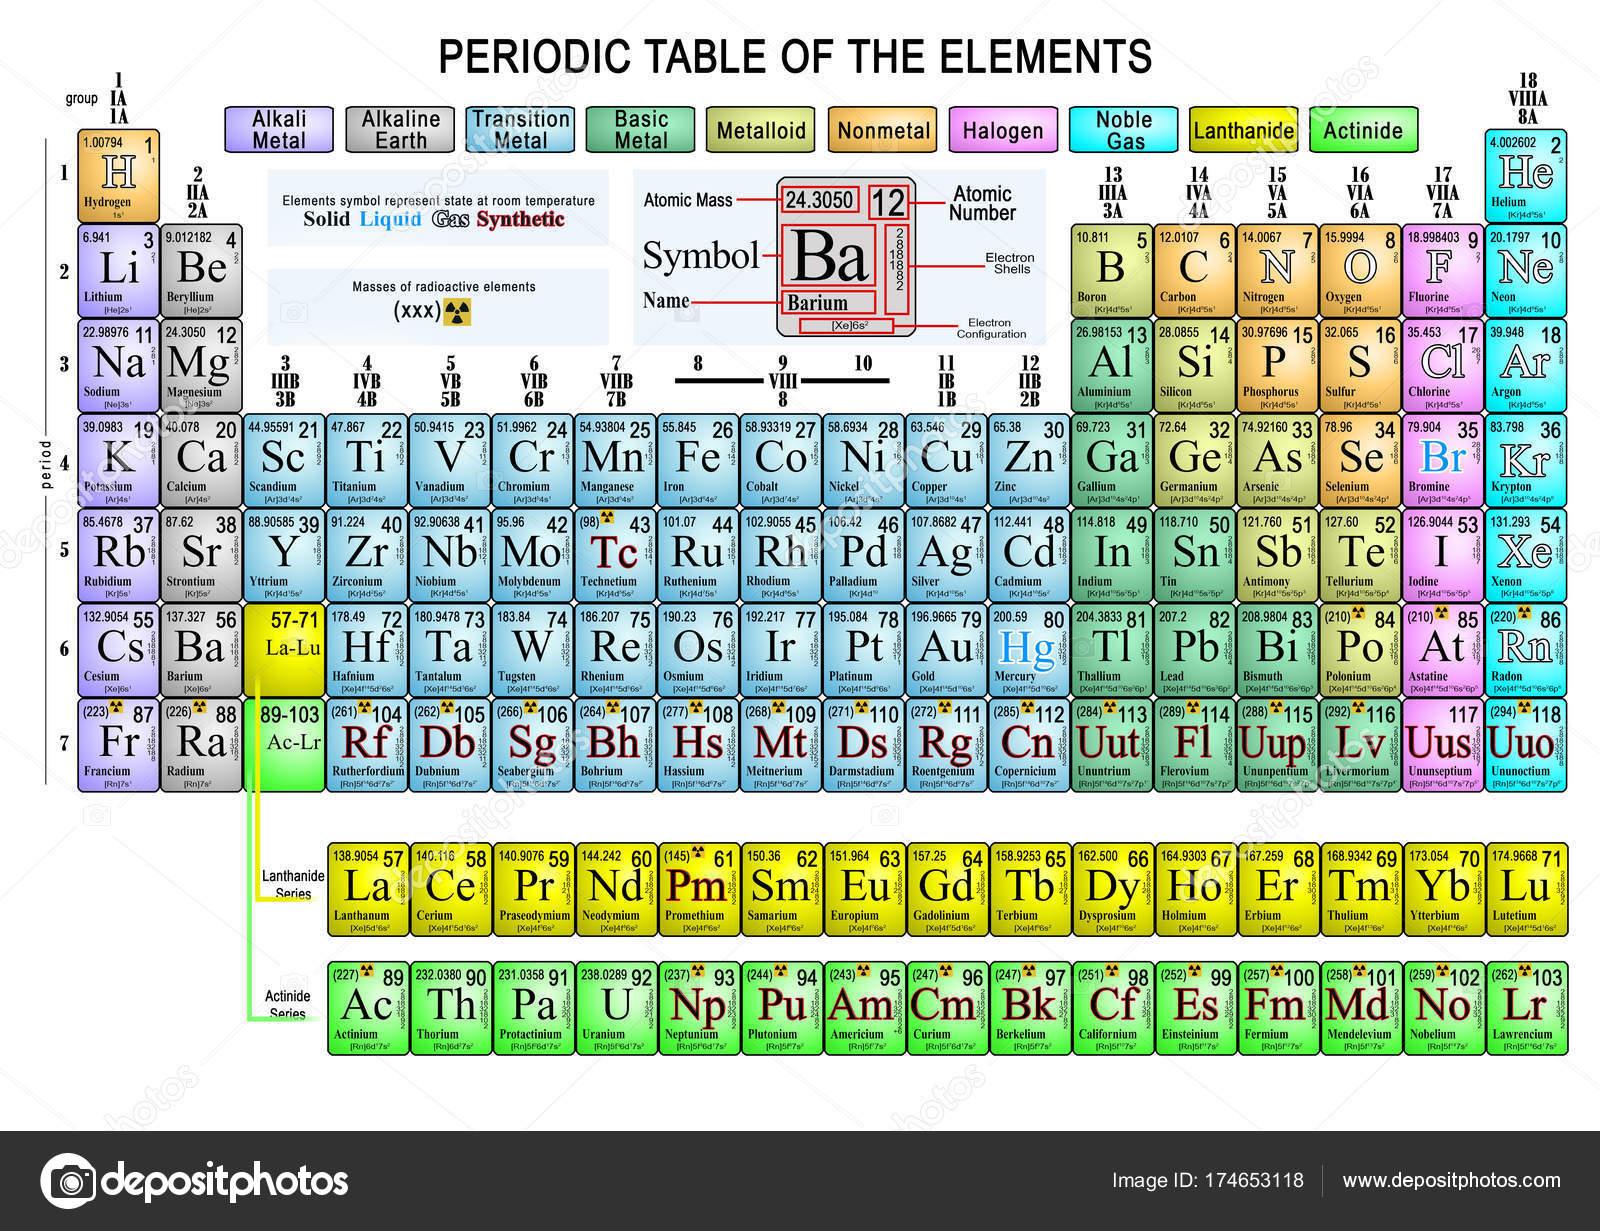 Periodic table of the elements complete stock photo davizro extended representation of the periodic table of colorful chemical elements photo by davizro urtaz Choice Image